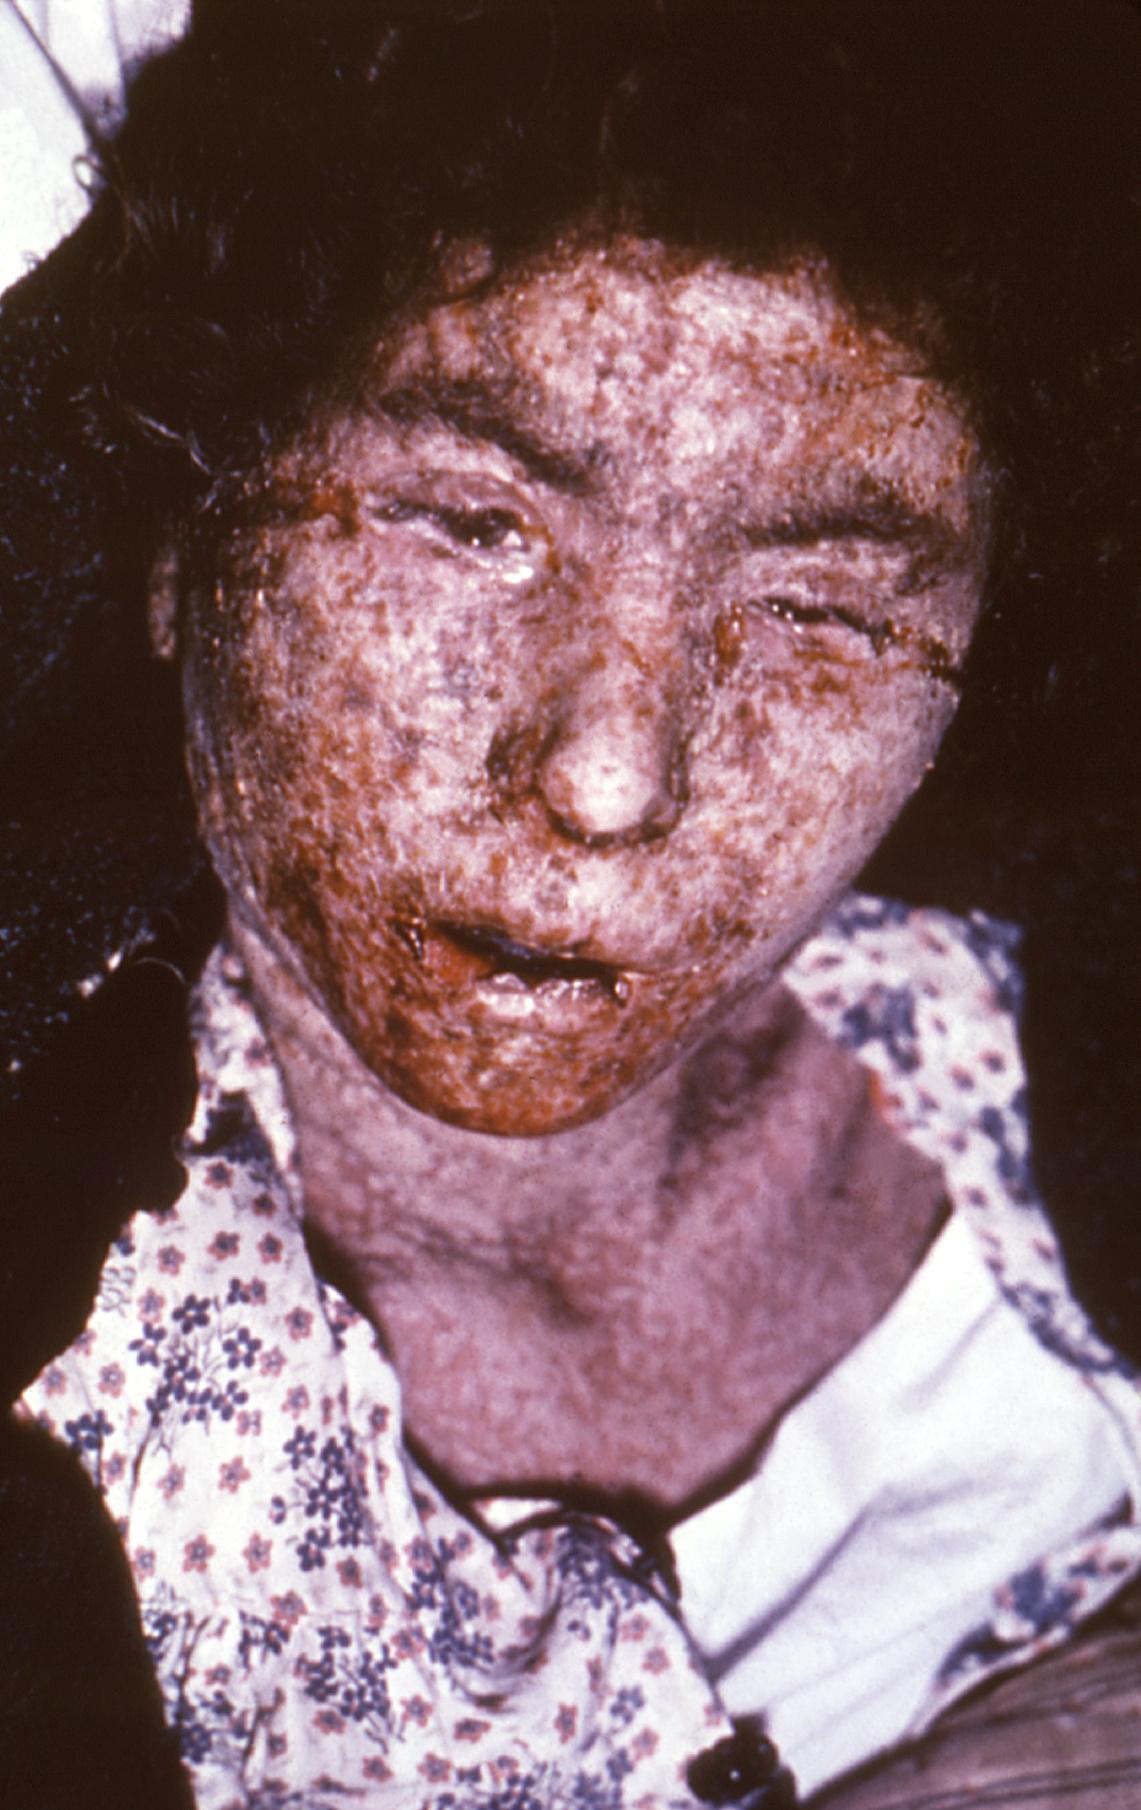 Symptoms of cowpox - Answers on HealthTap